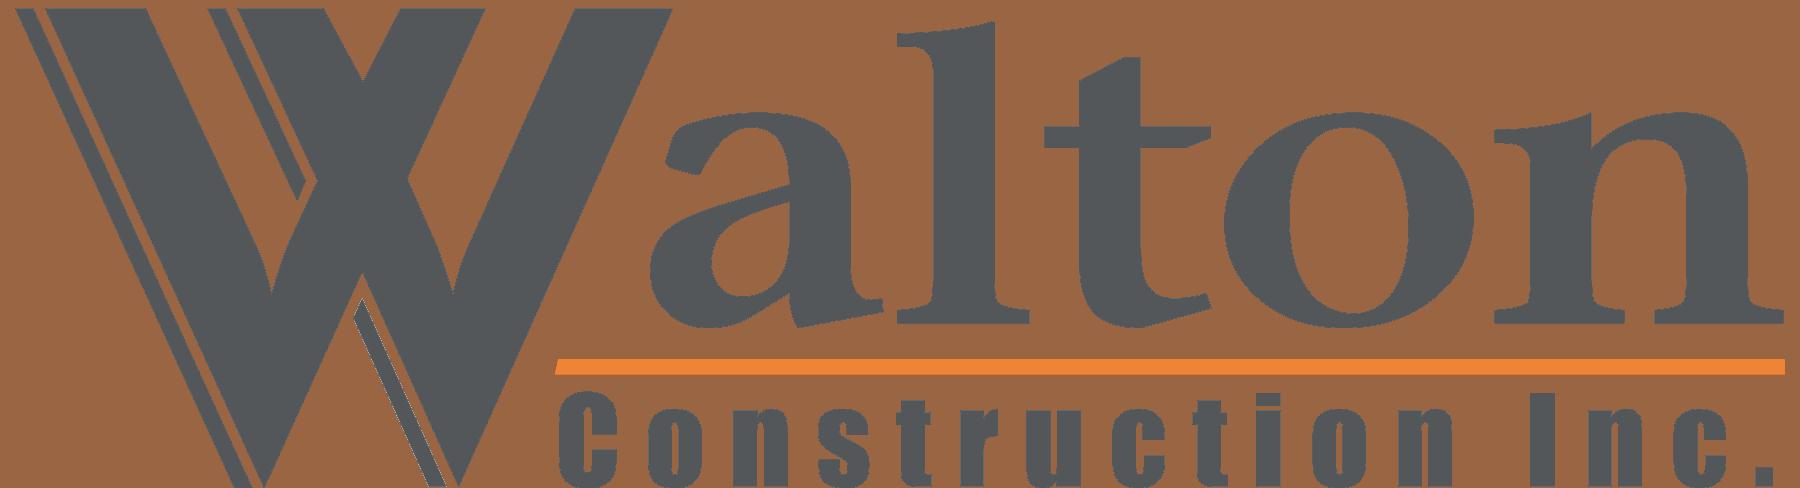 Walton Construction Inc.